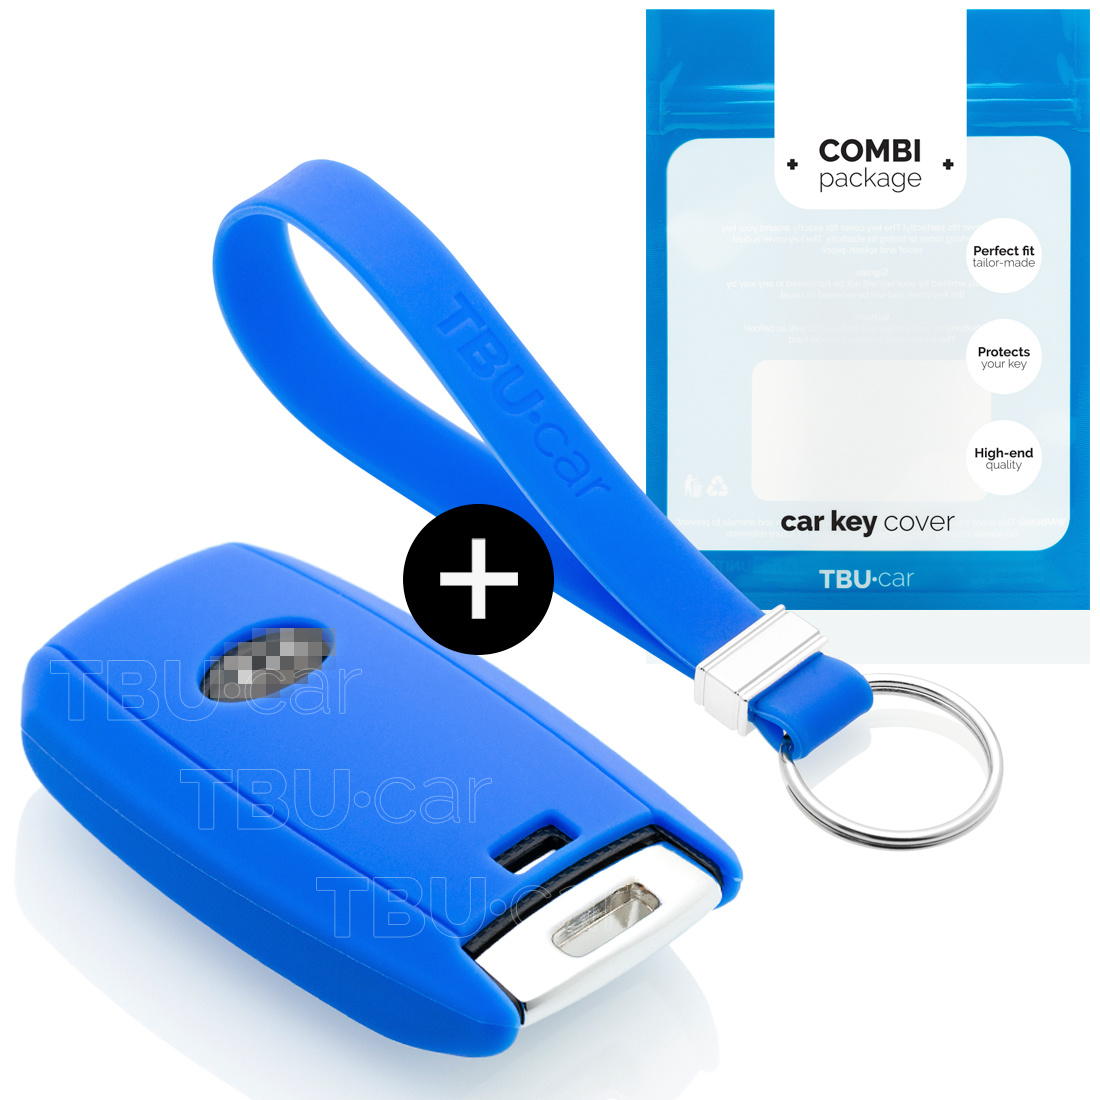 Kia Car key cover - Silicone Protective Remote Key Shell - FOB Case Cover - Blue